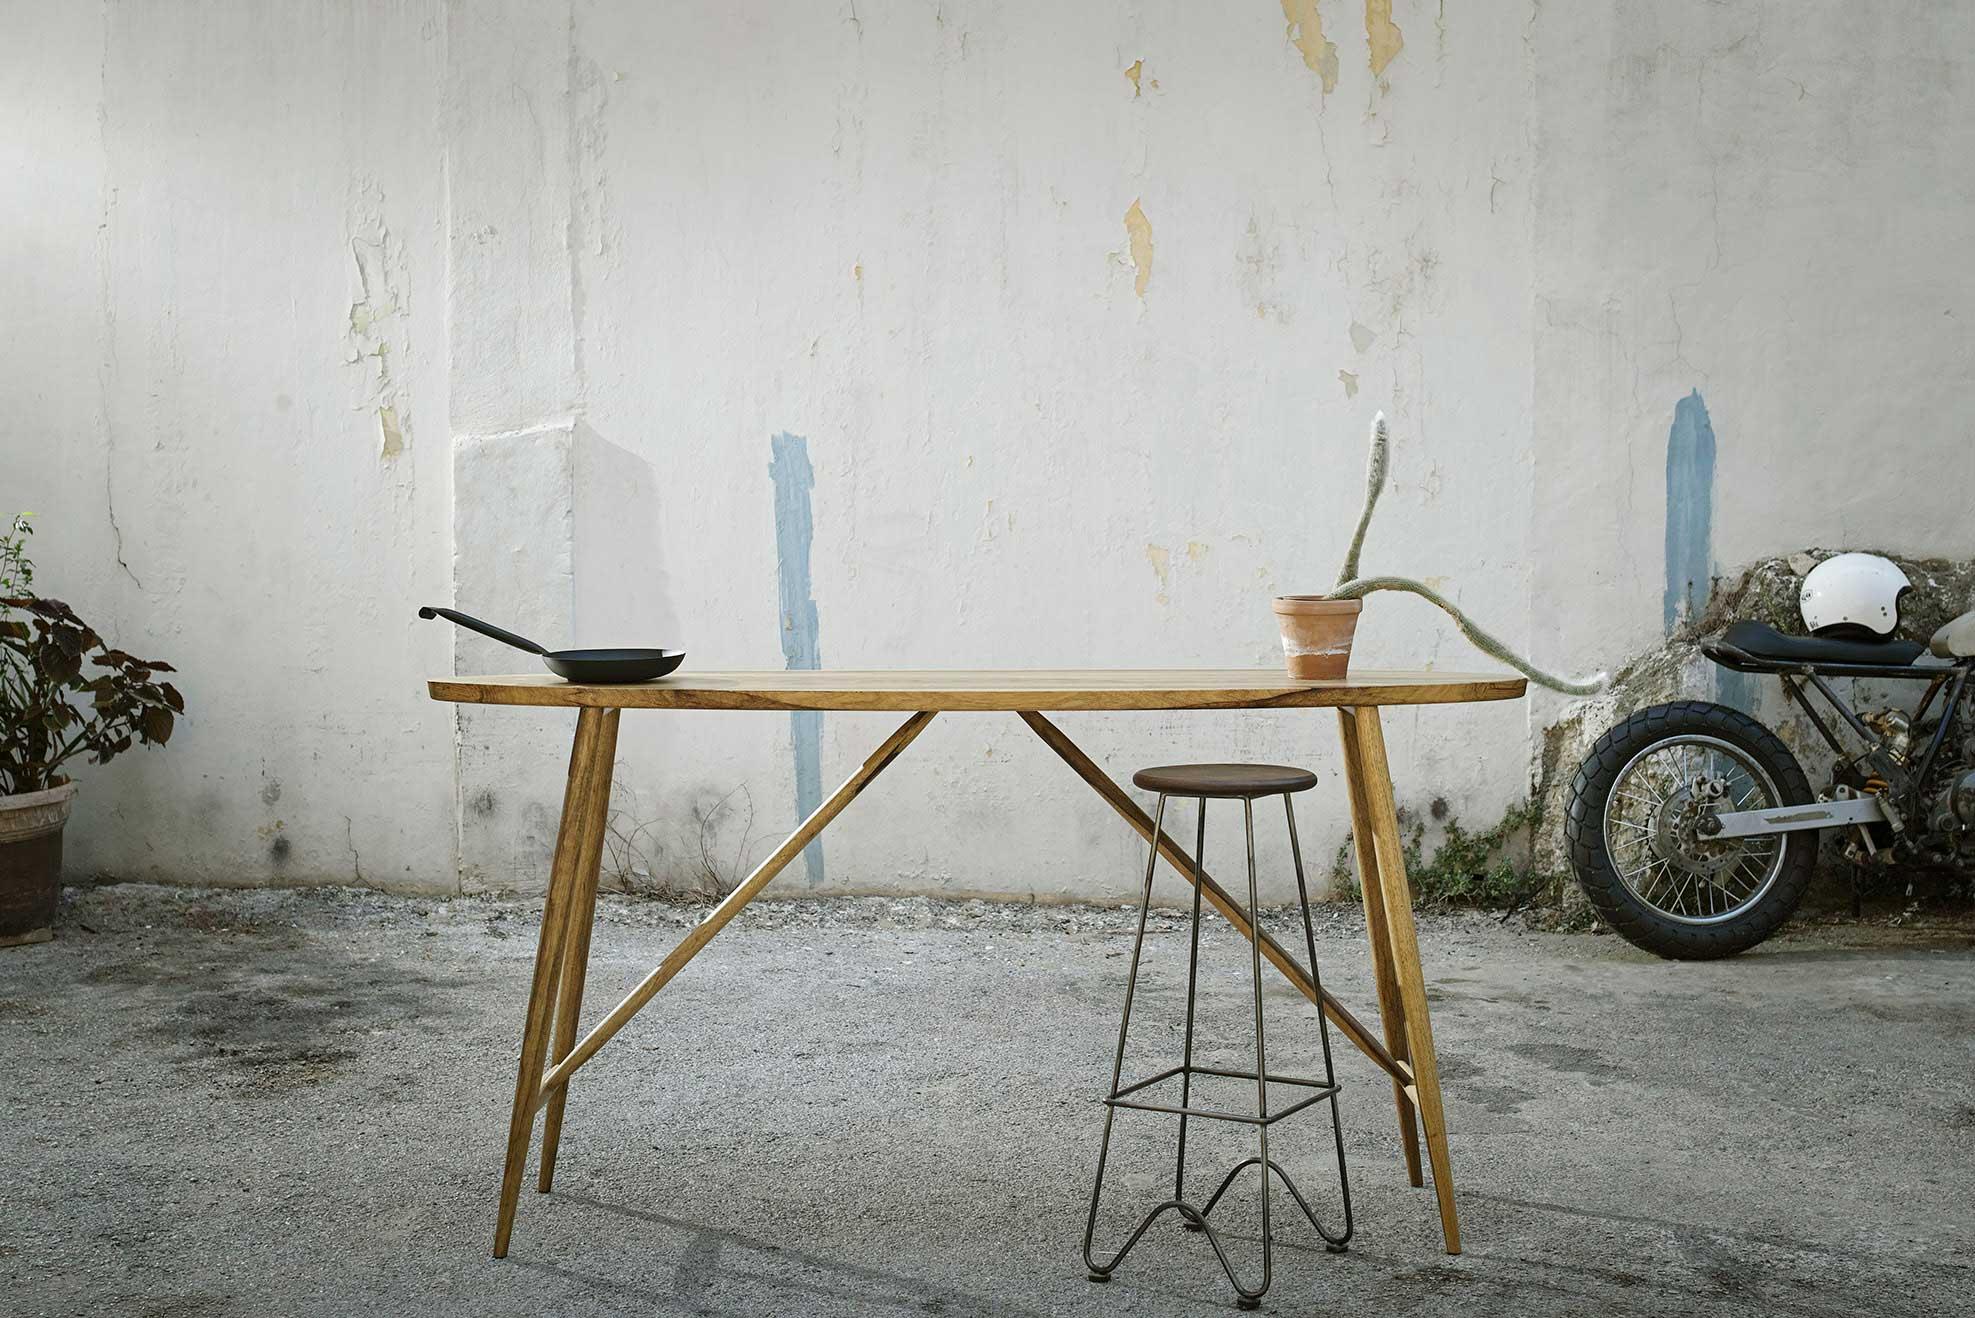 metal-and-wood-table-surf-console-hand-turned-lookbook.jpg